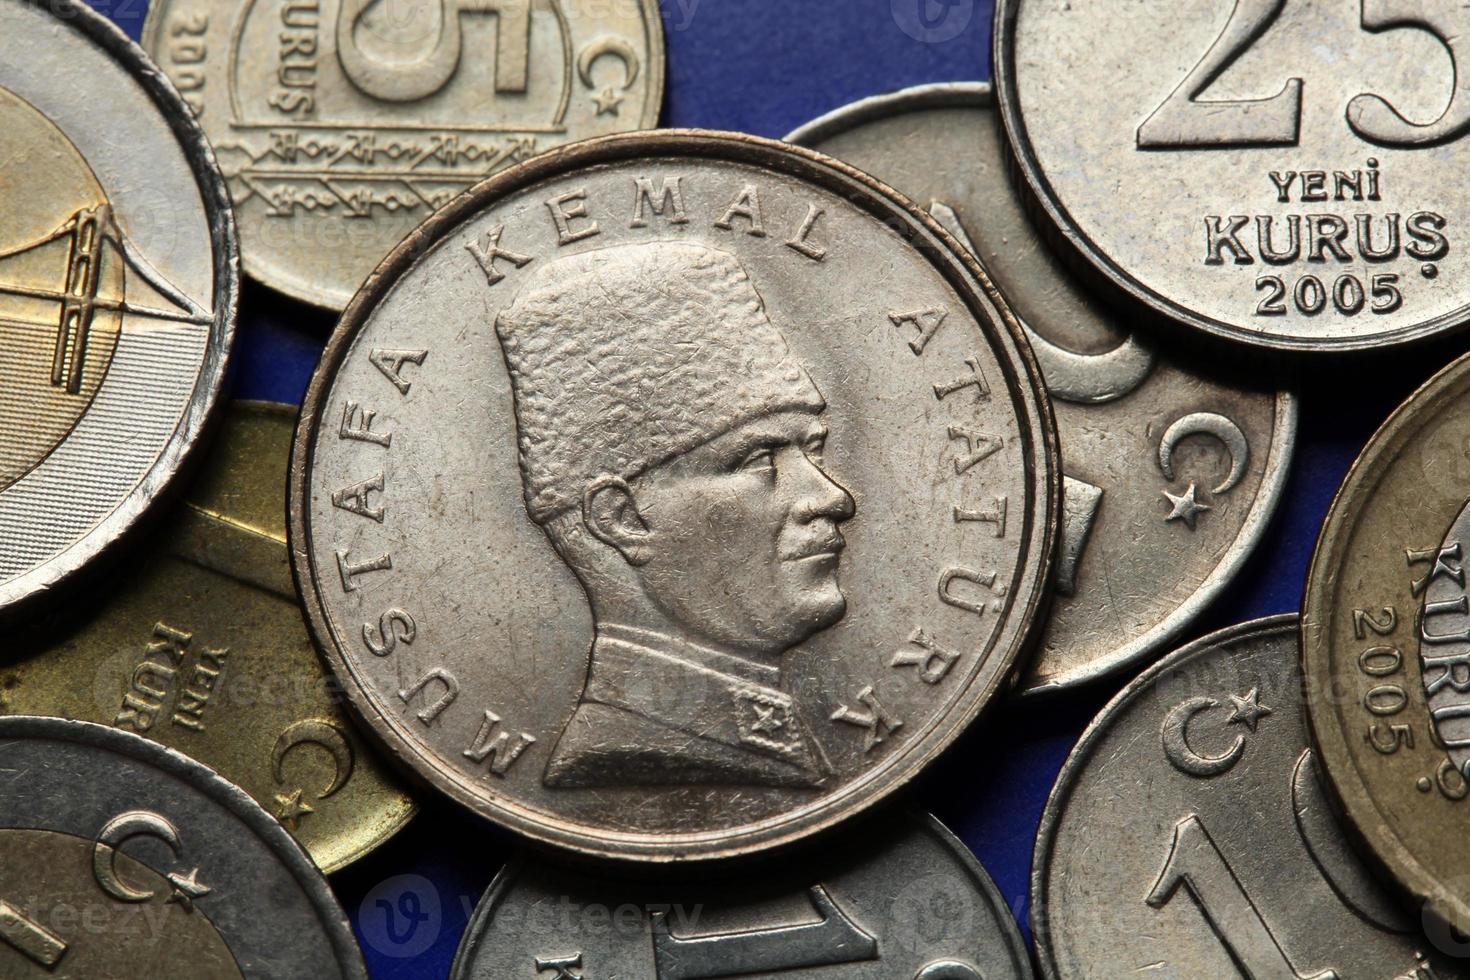 monete di tacchino. mustafa kemal ataturk foto